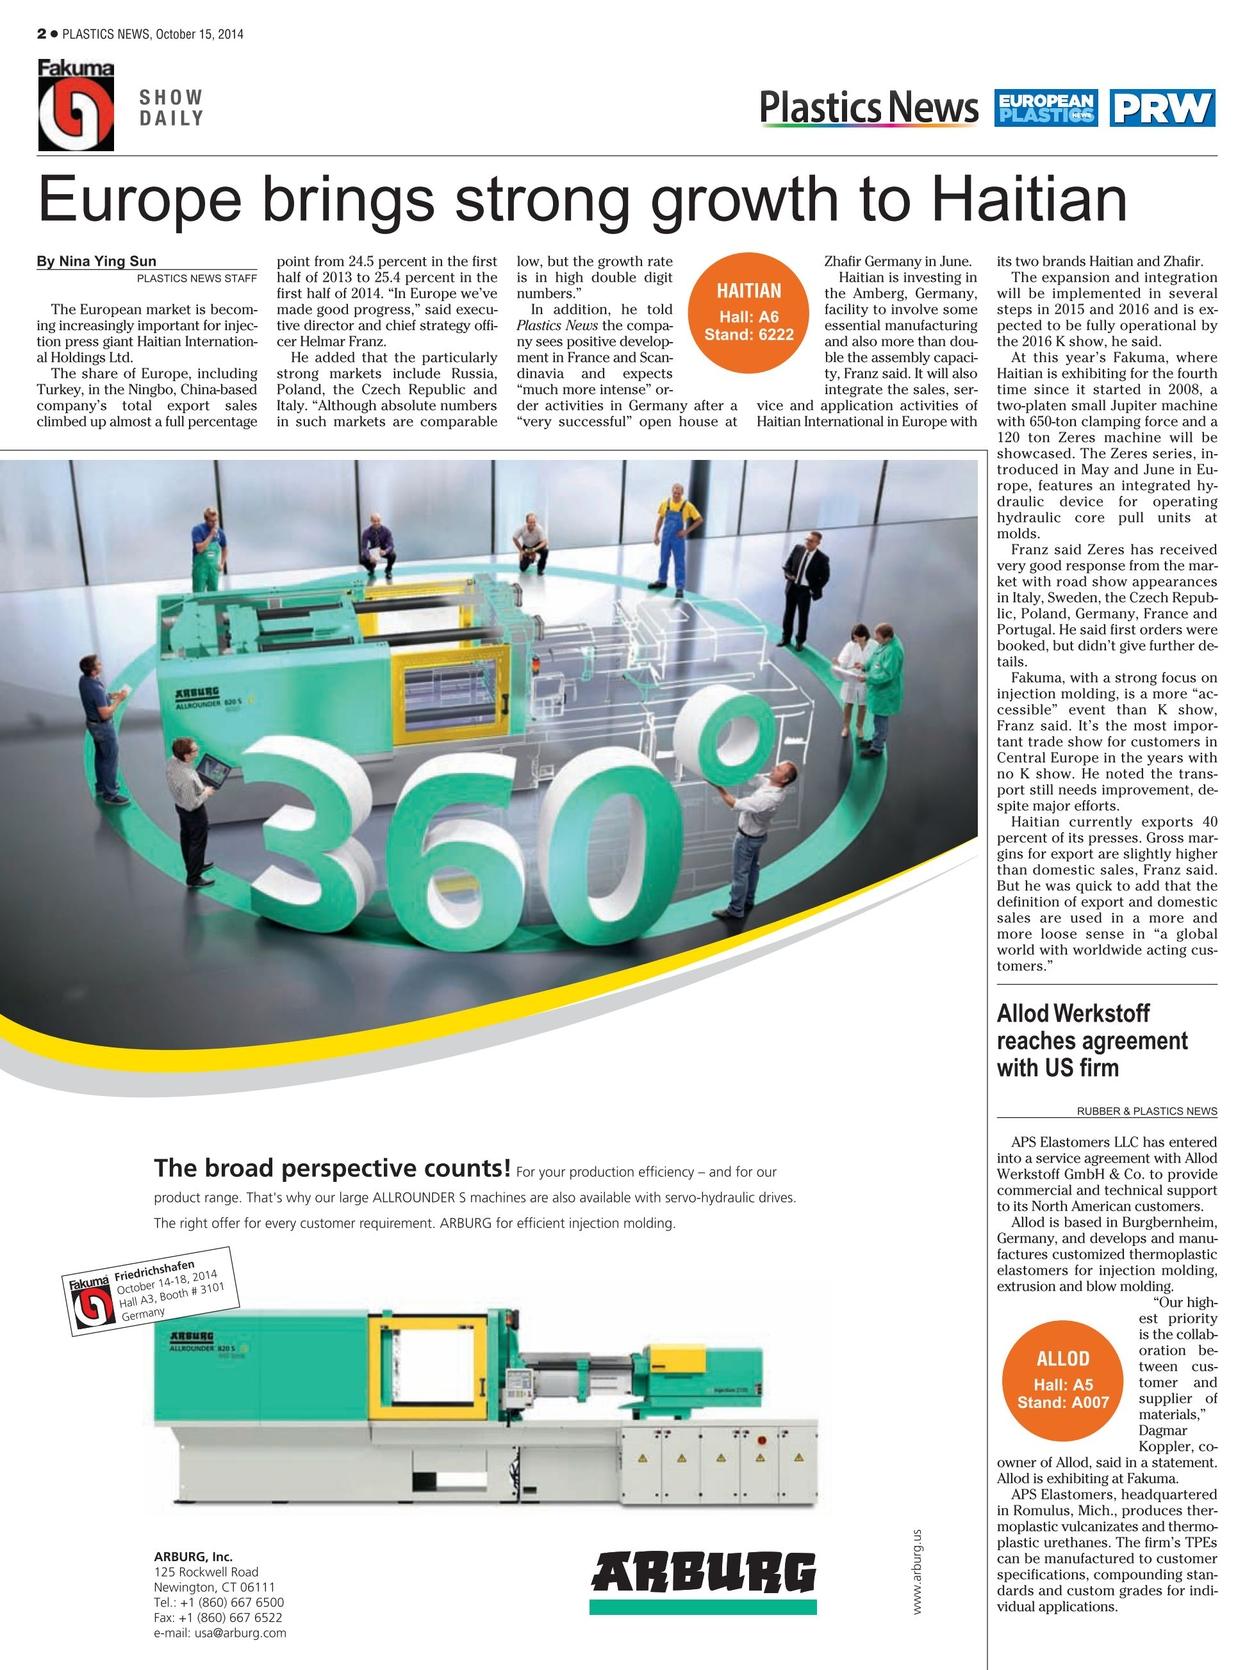 Plastics News Fakuma Show Daily - October 15, 2014